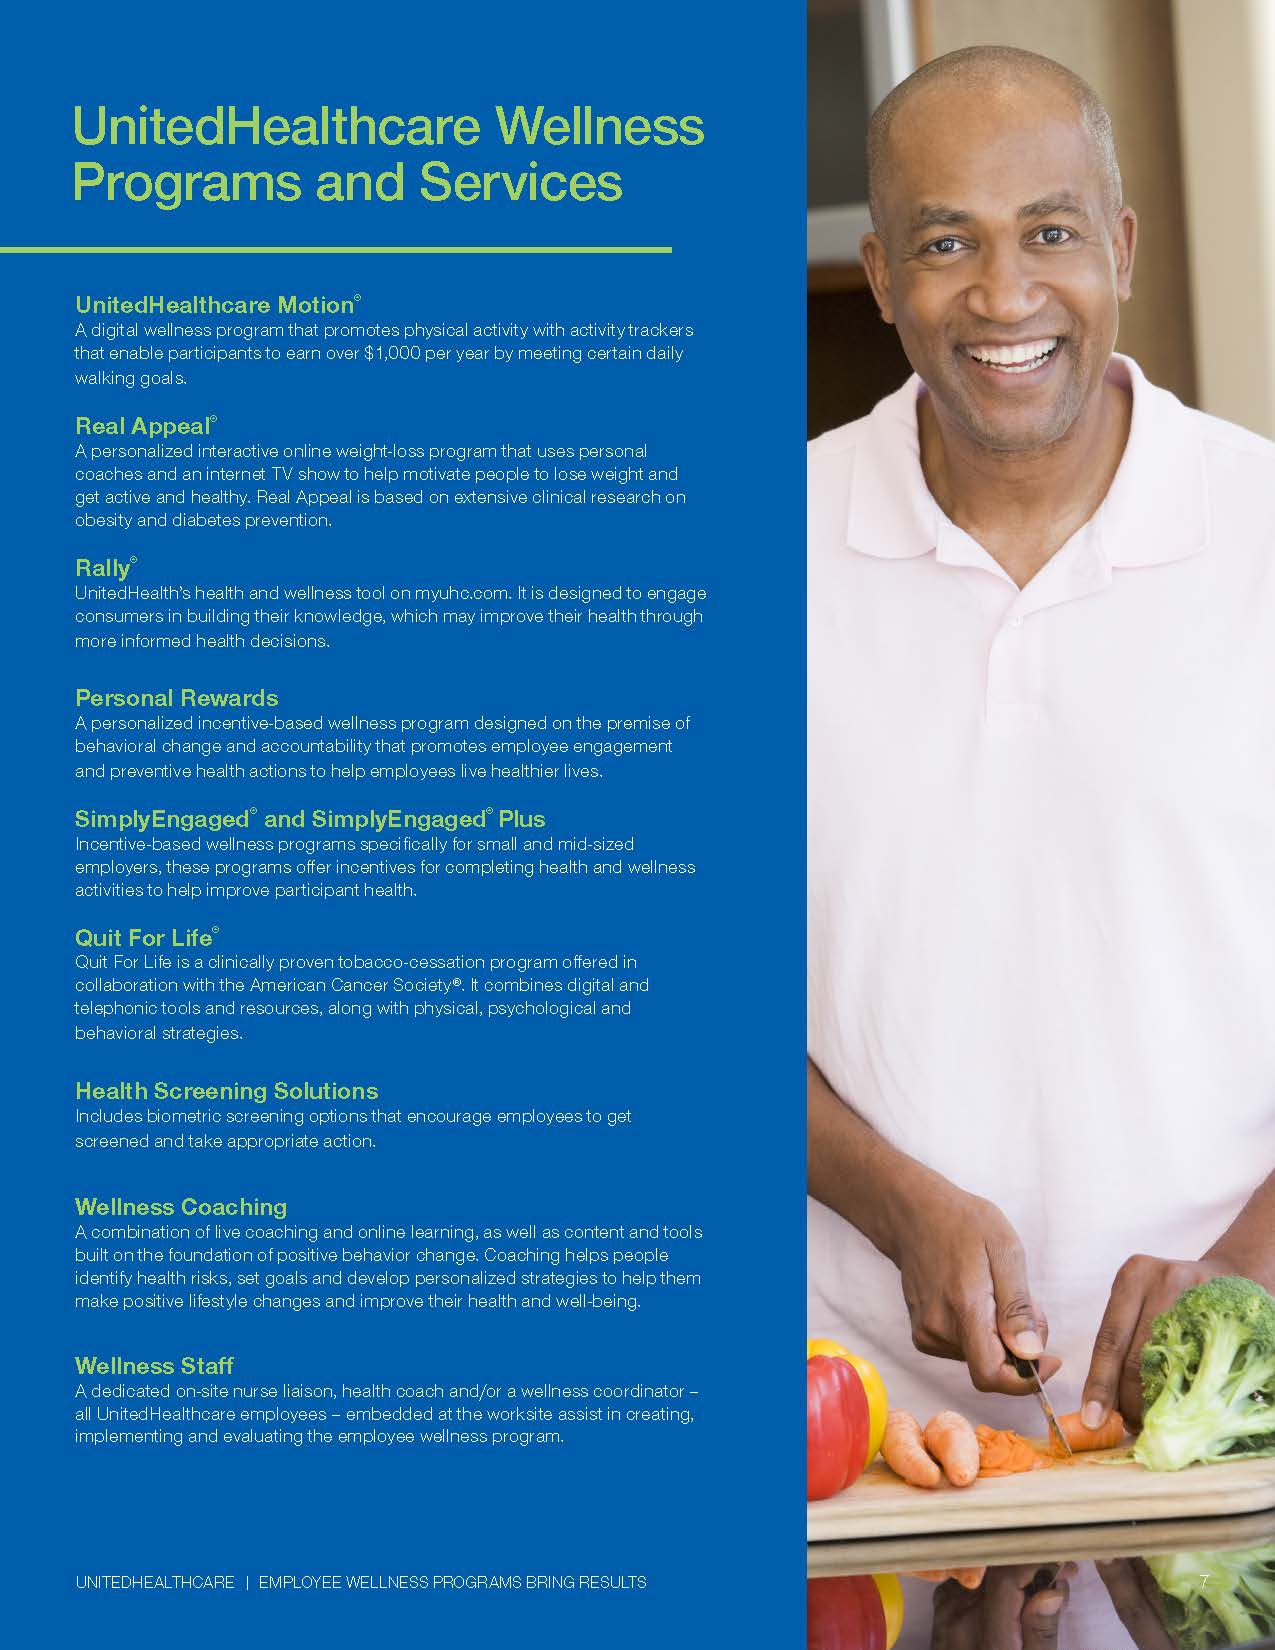 Newsroom Employee Wellness Programs Bring Results